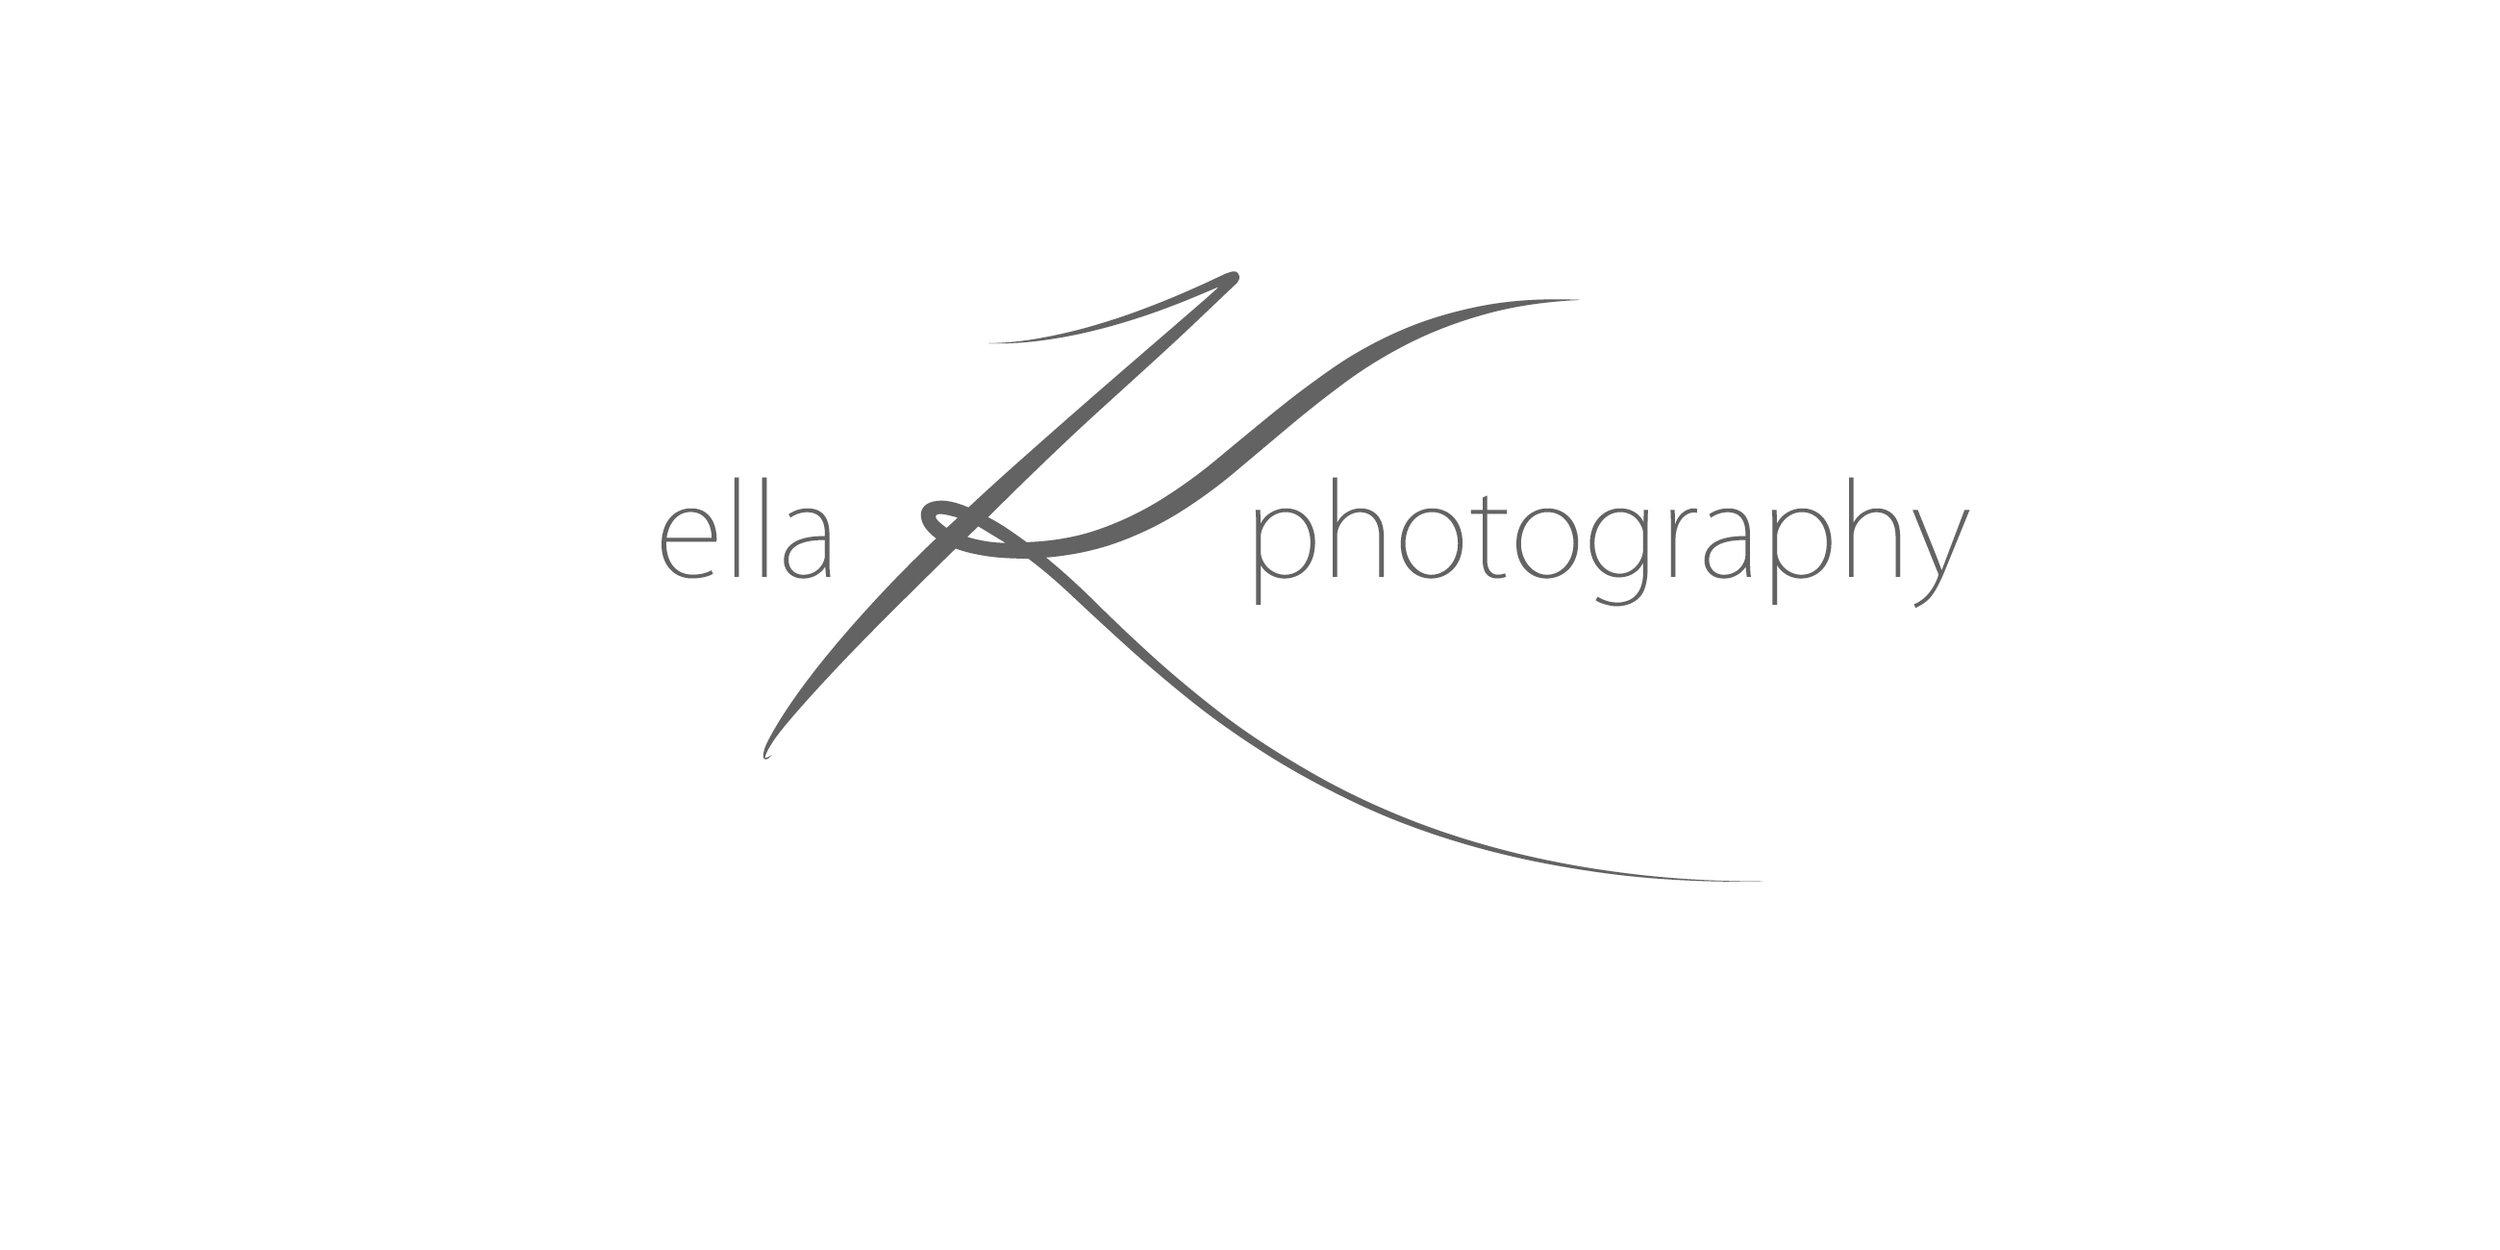 Ella K Photography